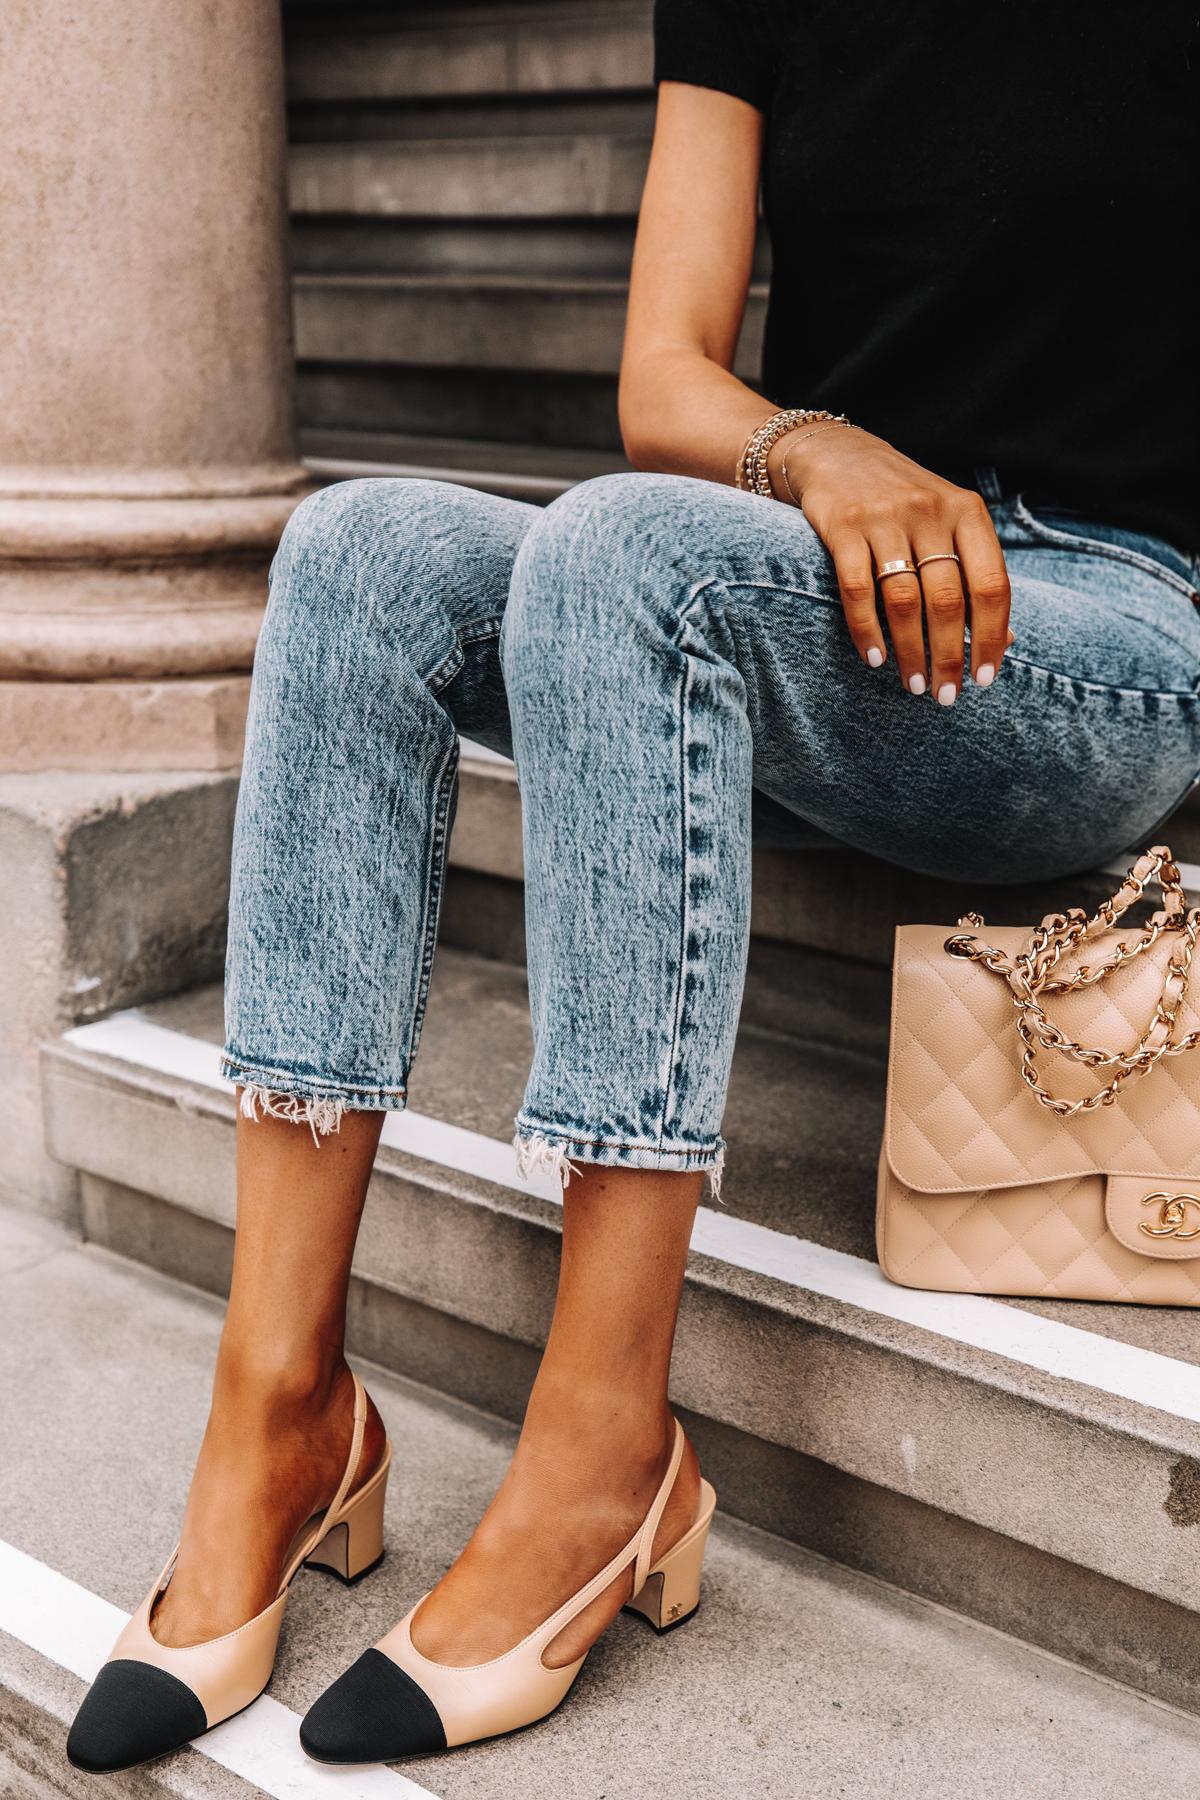 Fashion Jackson Wearing Short Sleeve Black Sweater High Rise Jeans Chanel Slingbacks Chanel Beige Jumbo Handbag 2